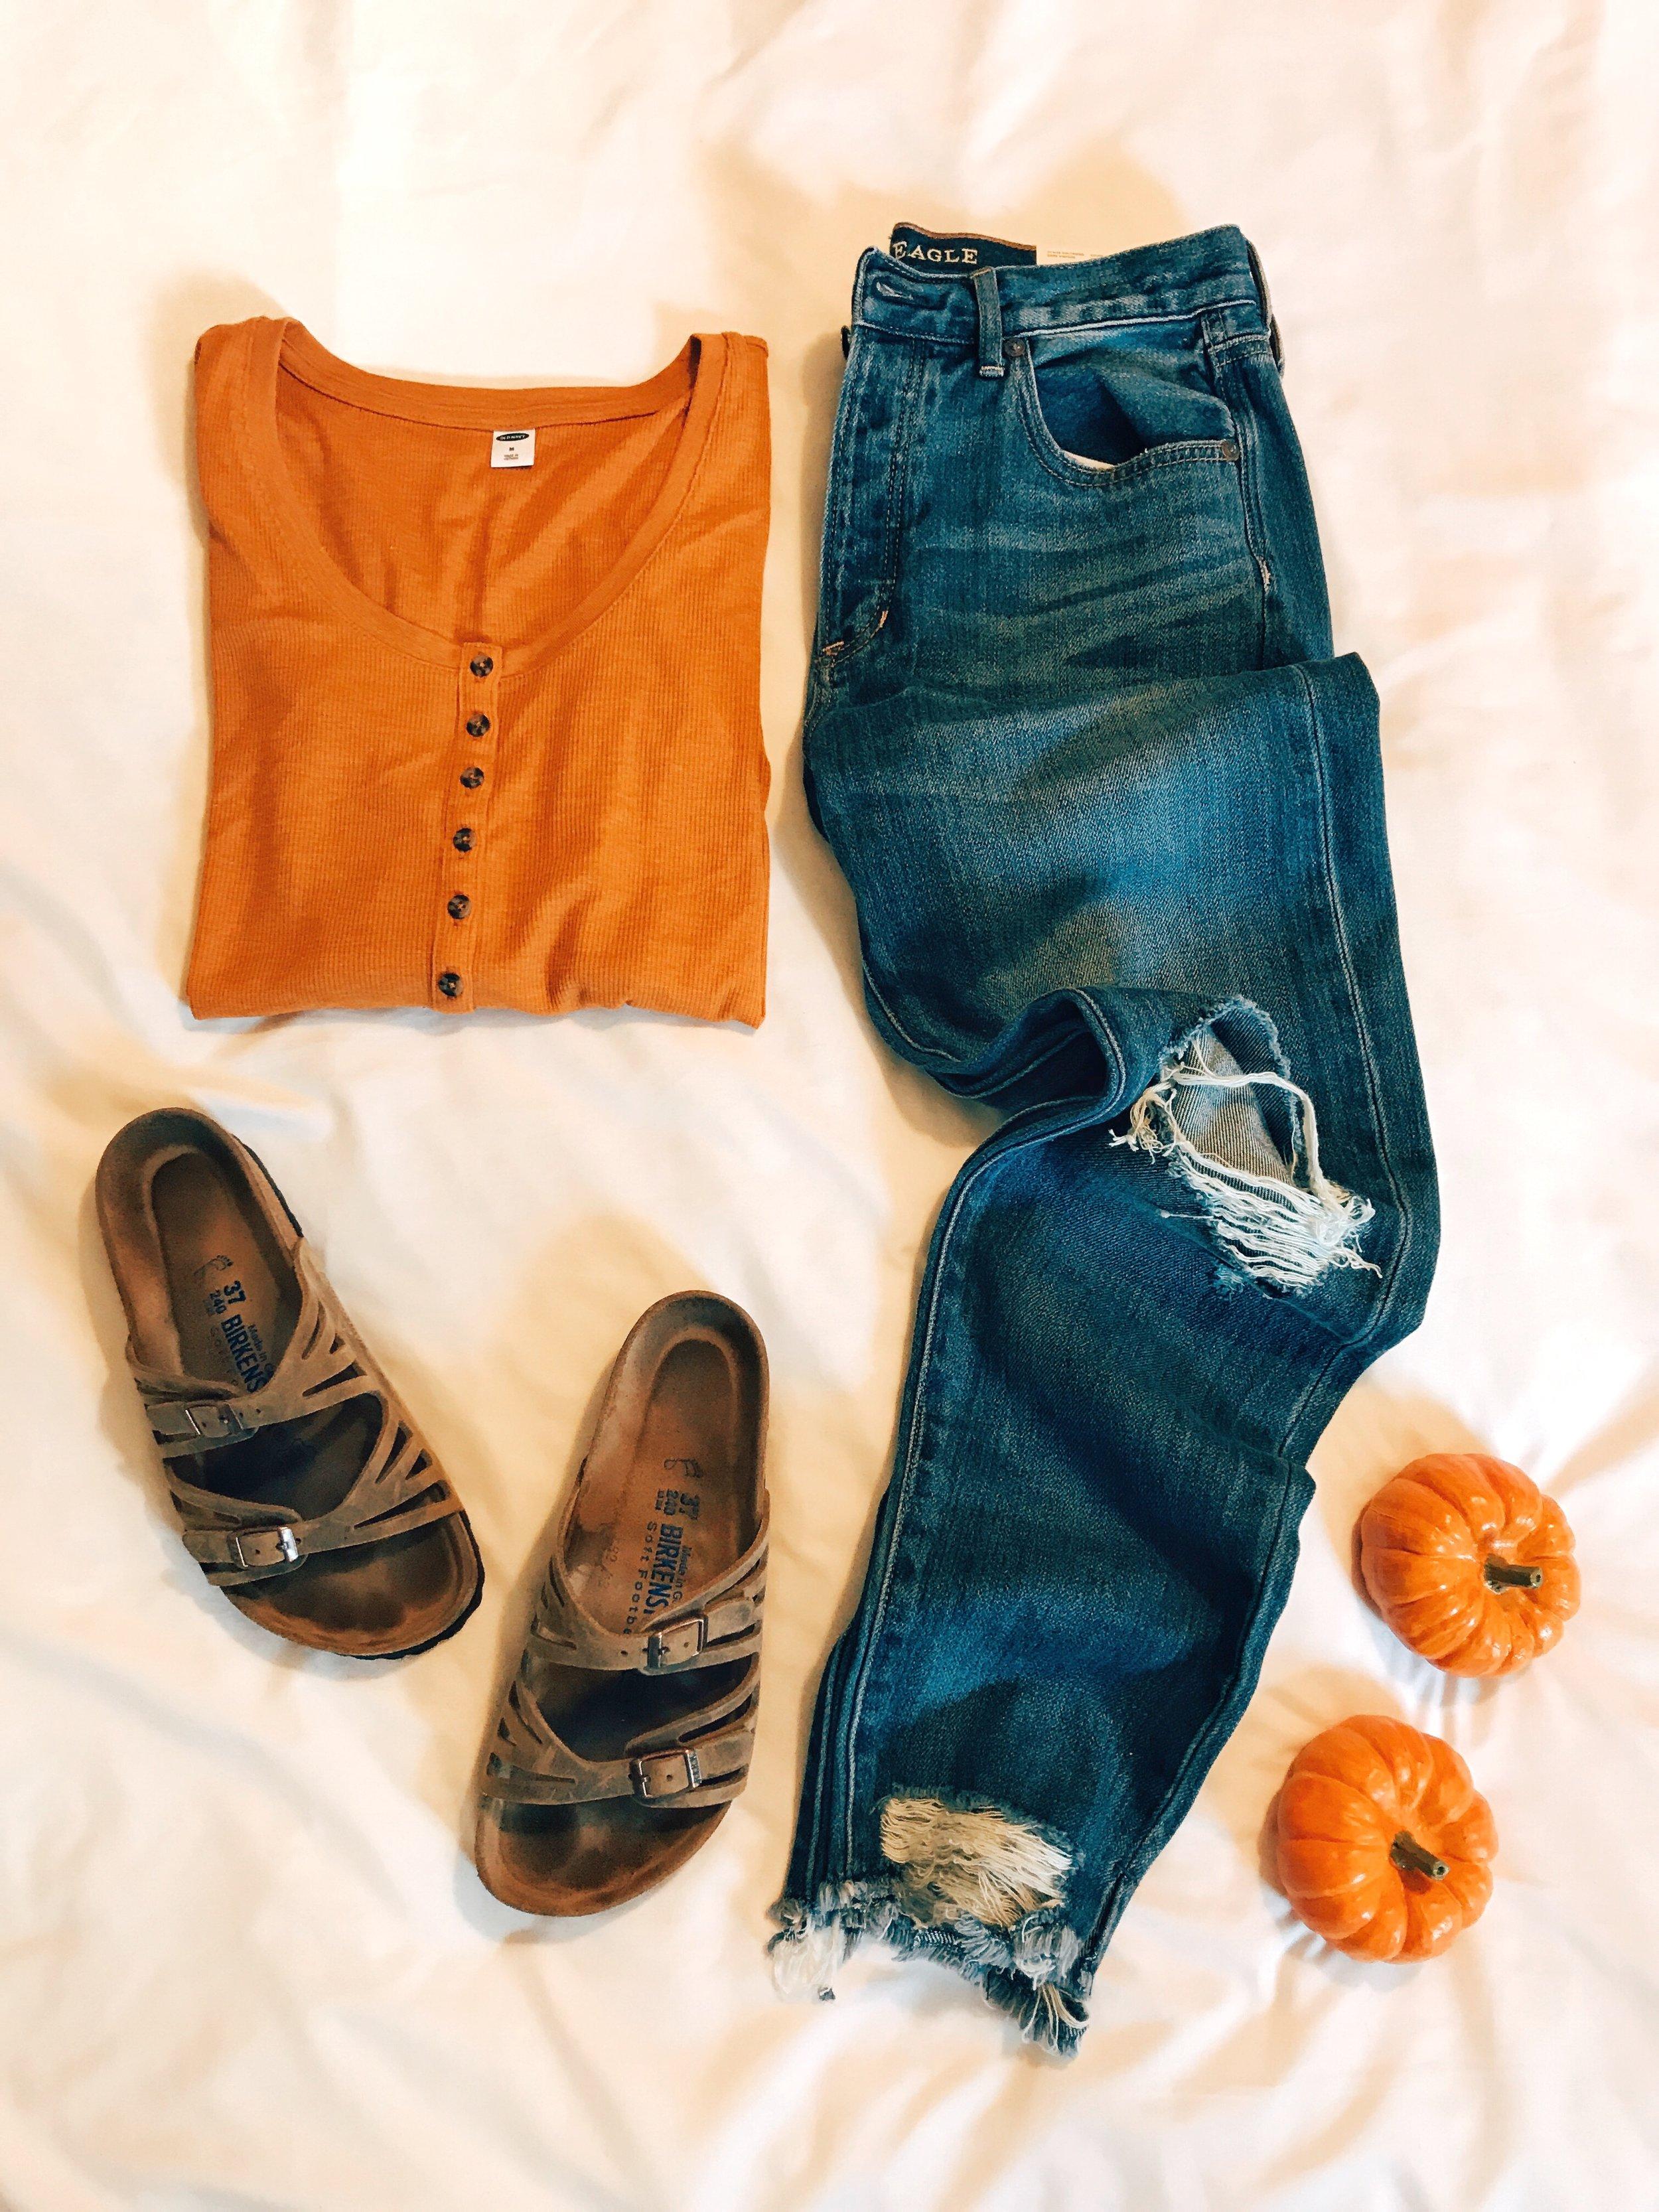 Henley  |  Jeans  |  Birkenstocks